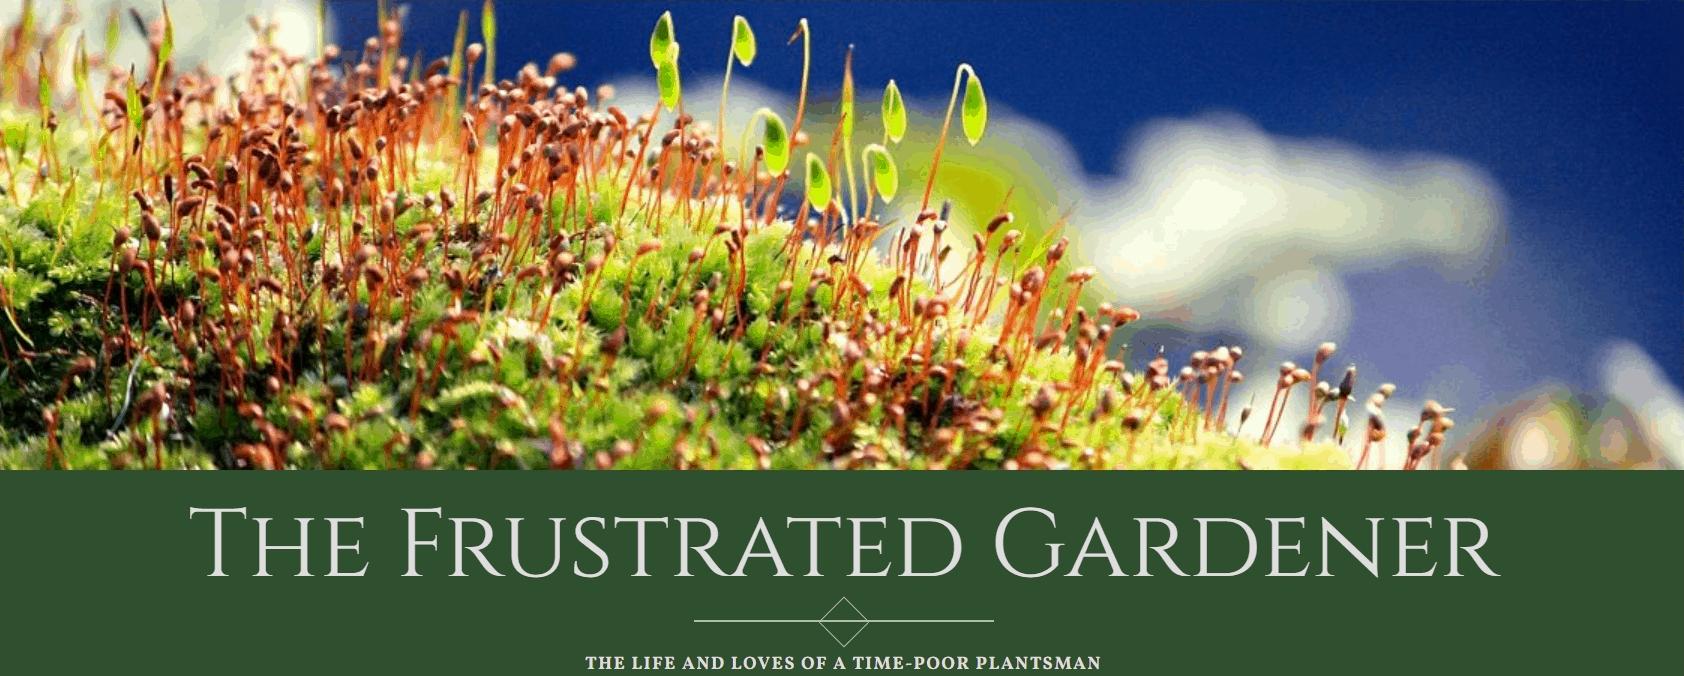 blog banner for the frustrated gardener